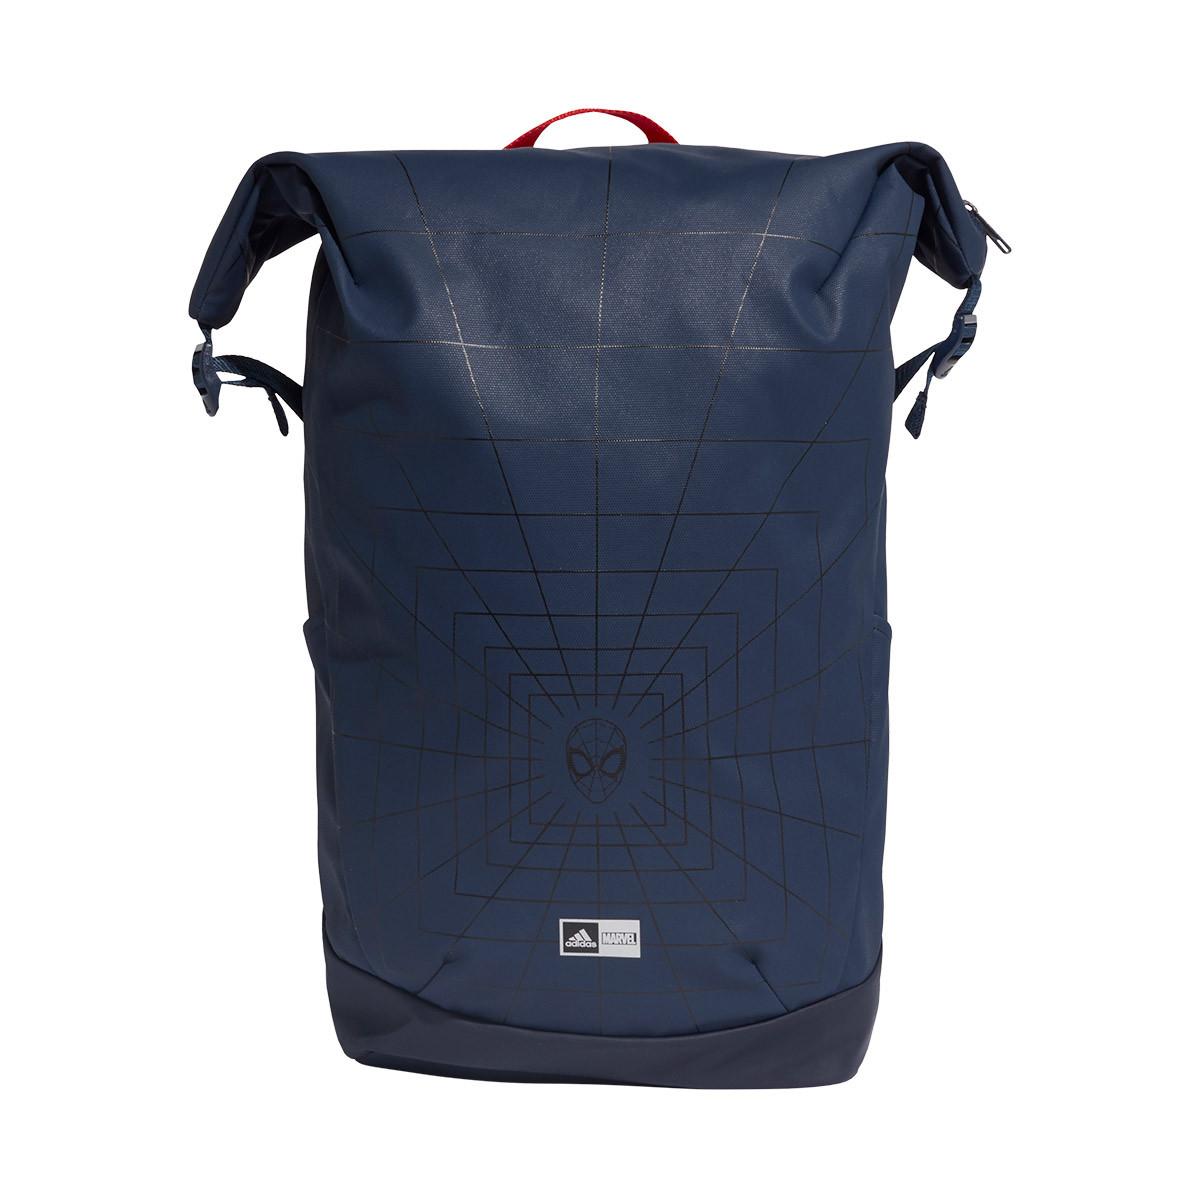 Escoger calidad vaso  Backpack adidas Spiderman BP Collegiate Navy-Silver - Football store Fútbol  Emotion